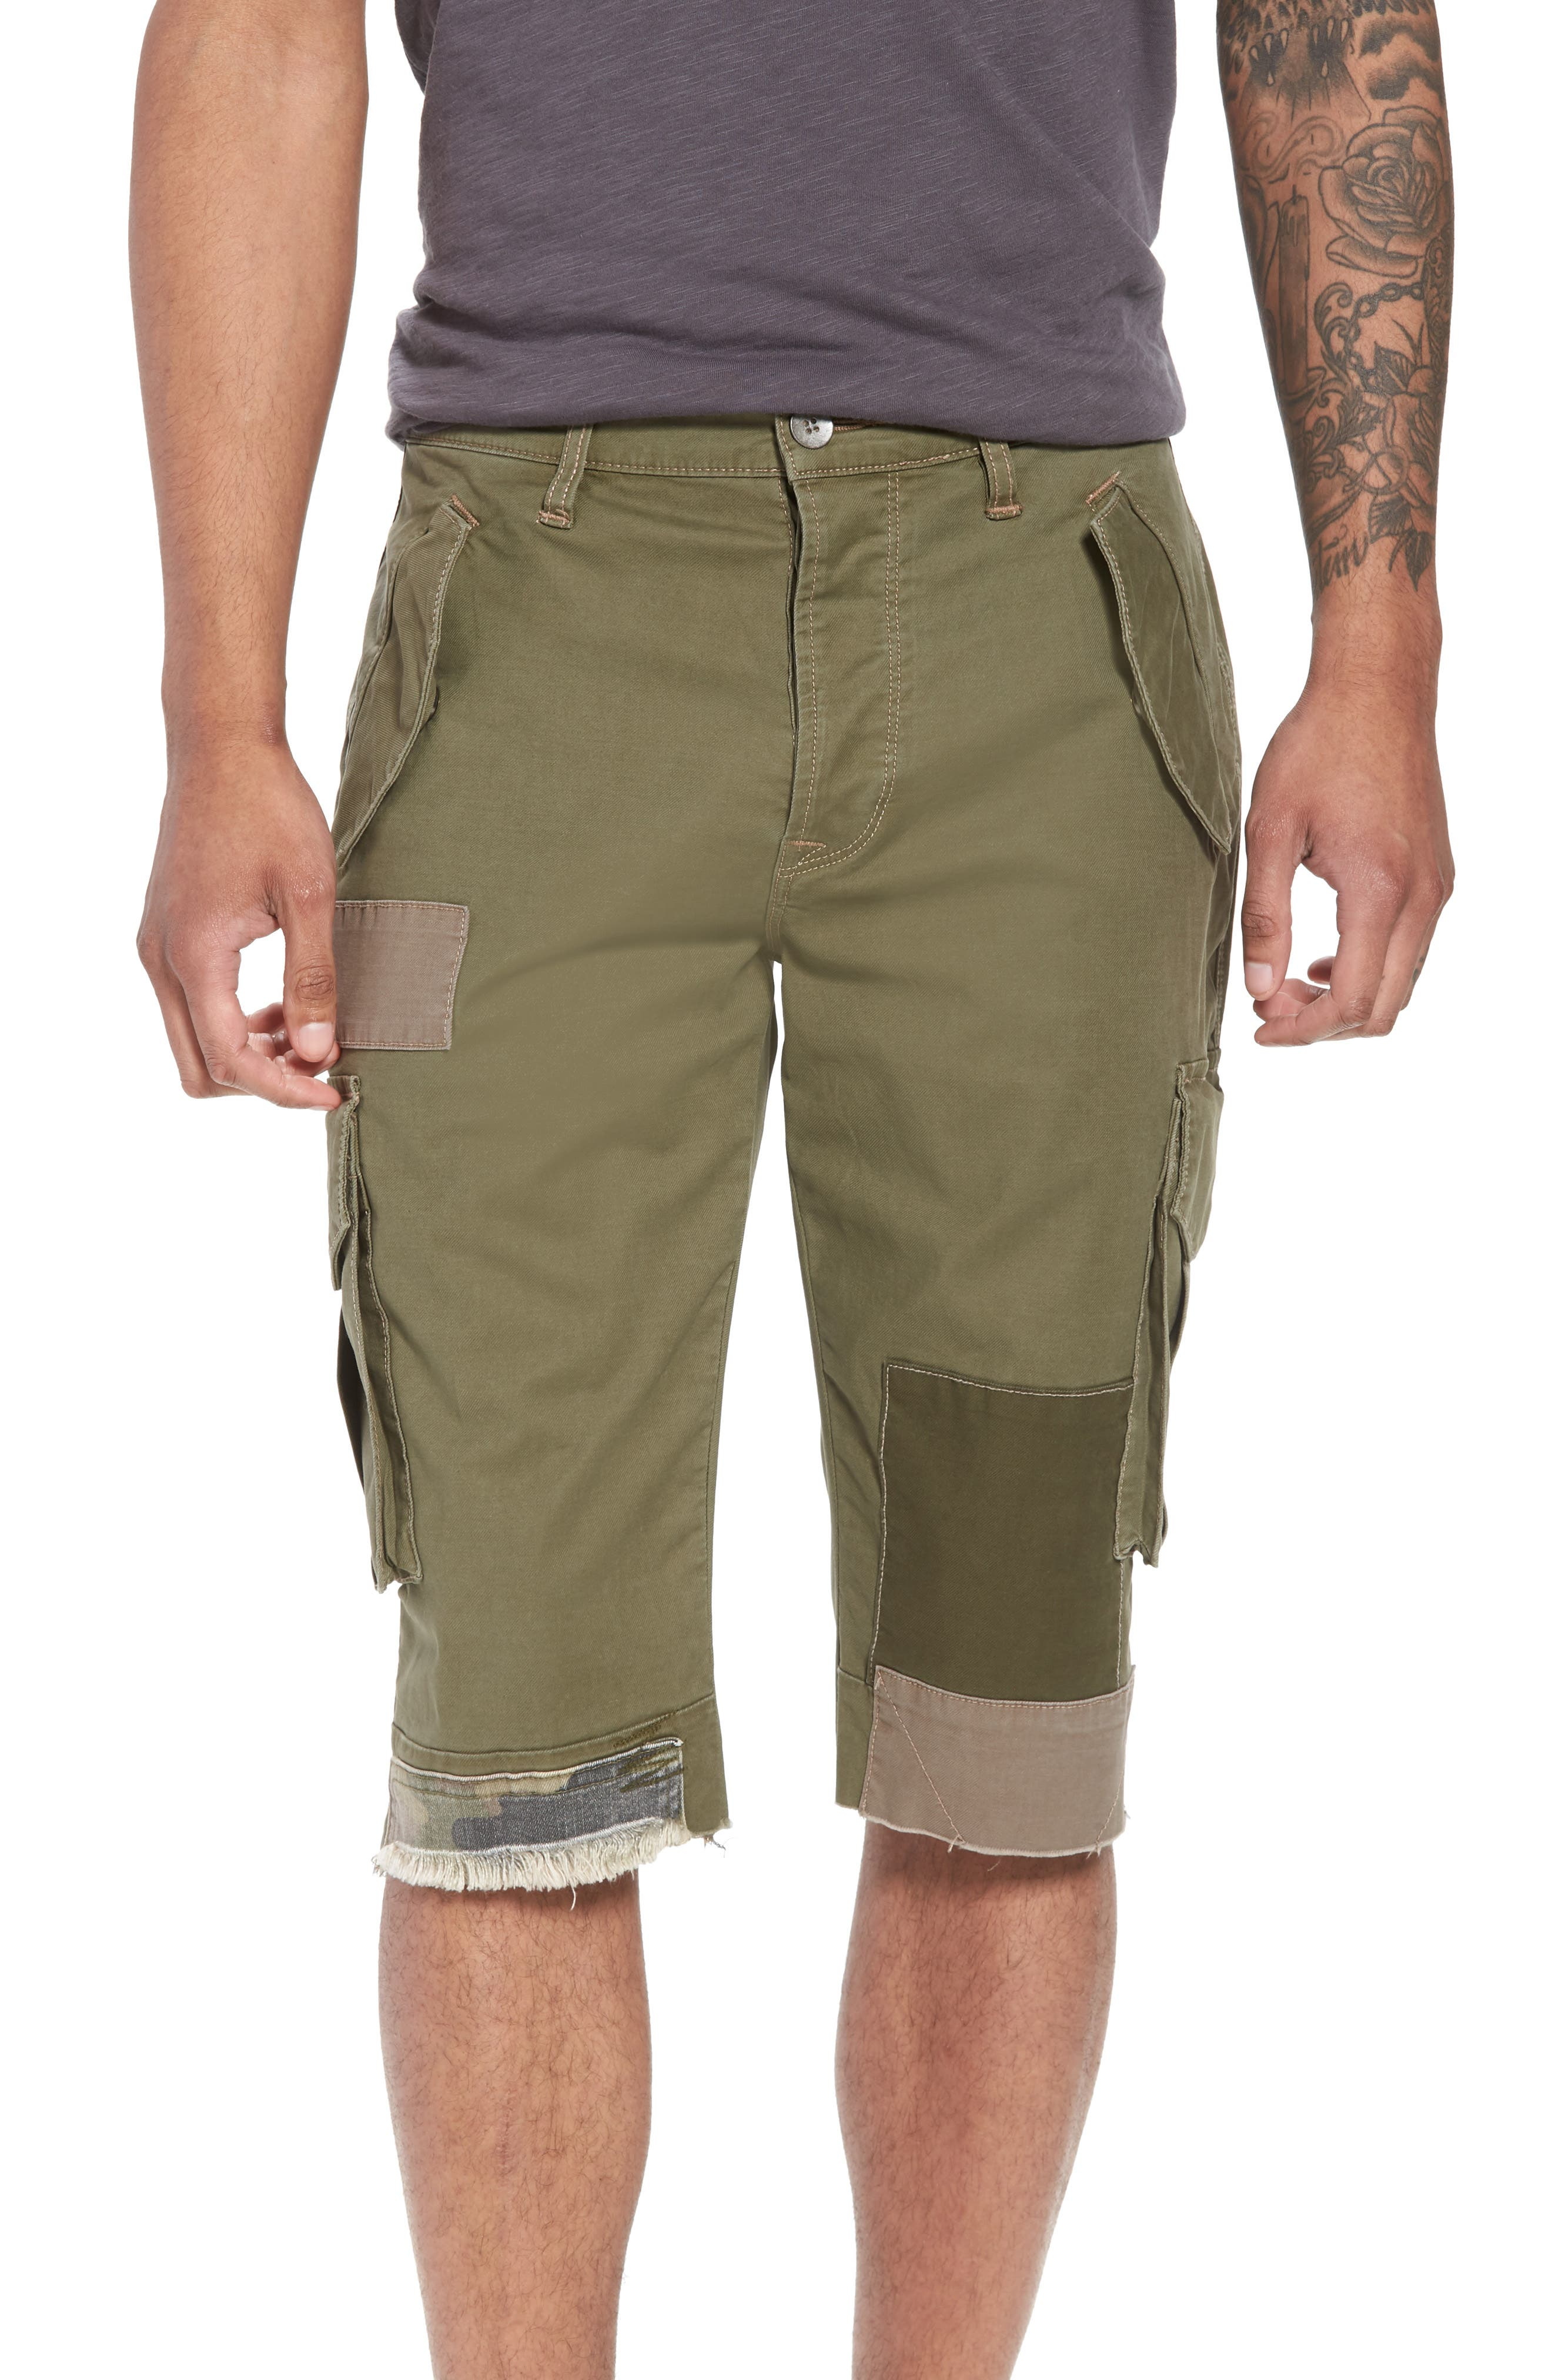 Slim Fit Cargo Shorts,                             Main thumbnail 1, color,                             Army Green 2